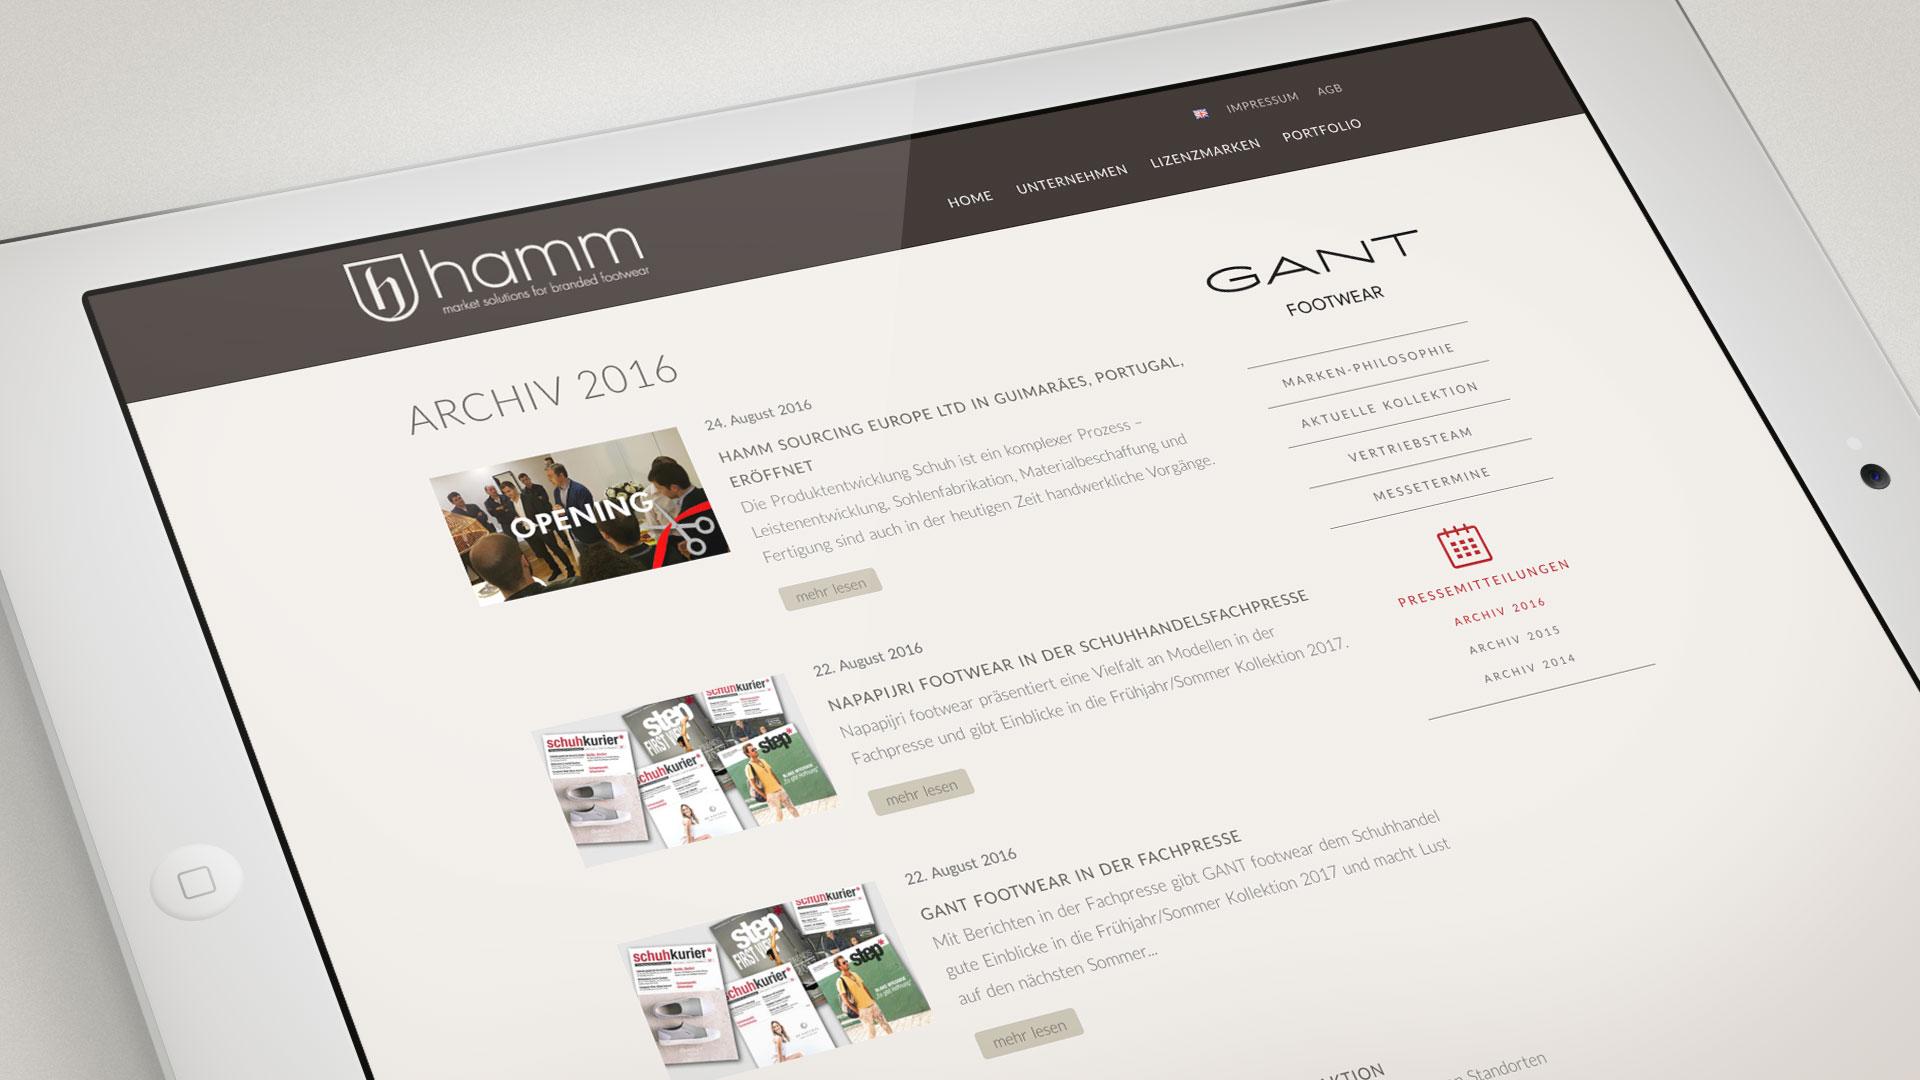 artventura-Projekt Webentwicklung hamm-footwear.com: Pressearchv der Lizenz-Marke GANT footwear